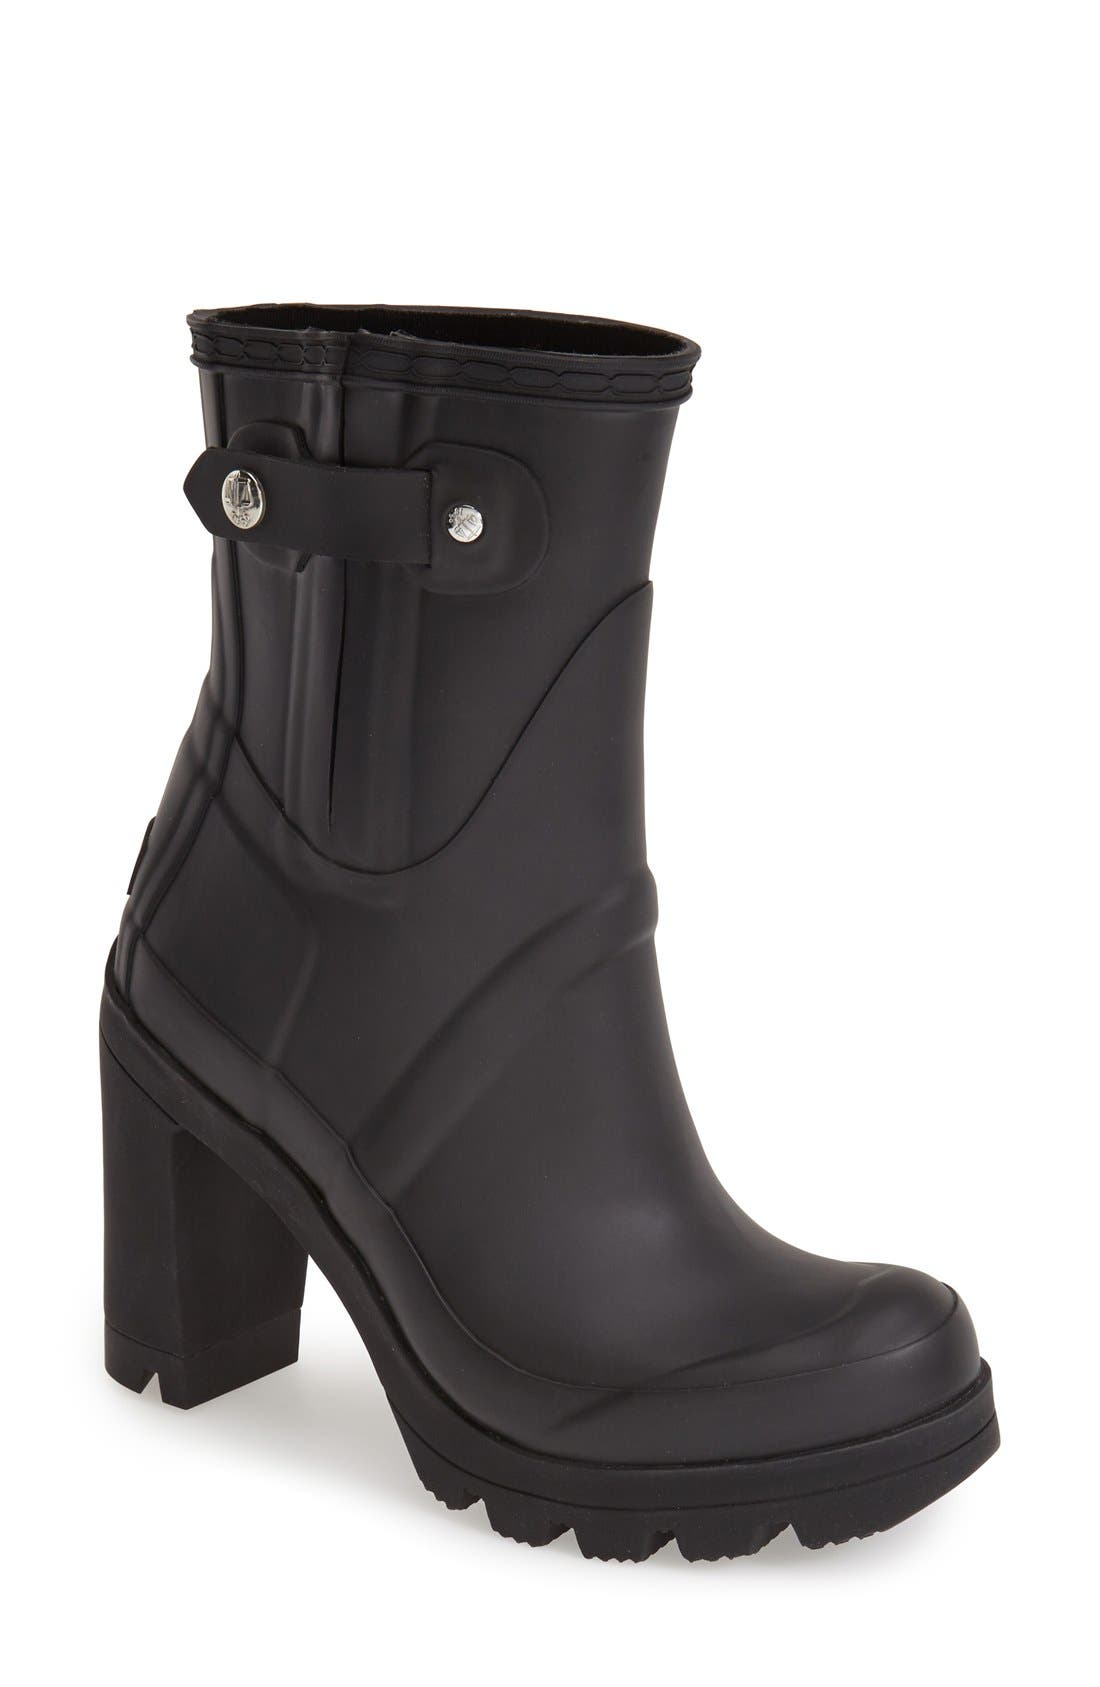 Original High Heel Women US 9 Black Rain Boot